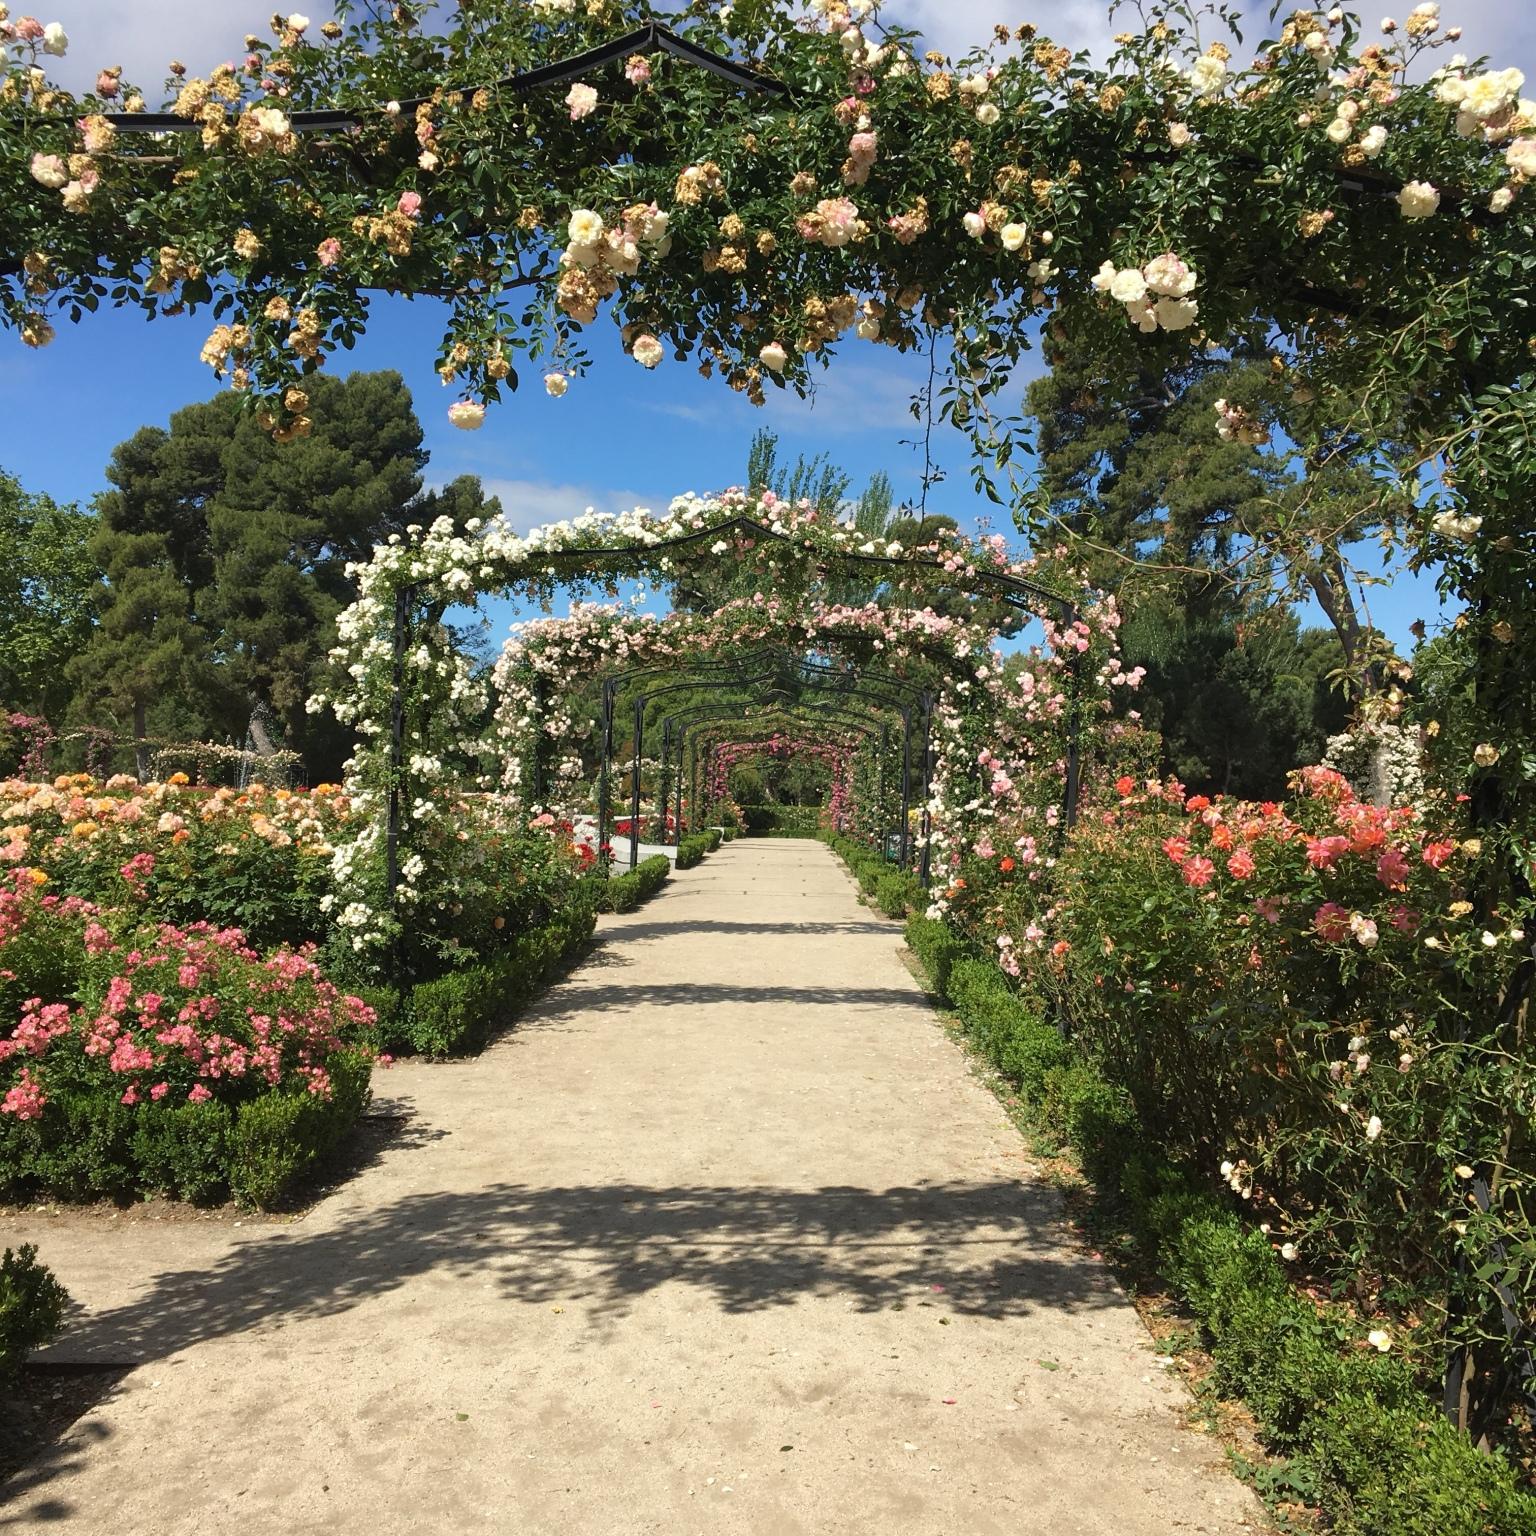 Buen Retiro Park rose gardens